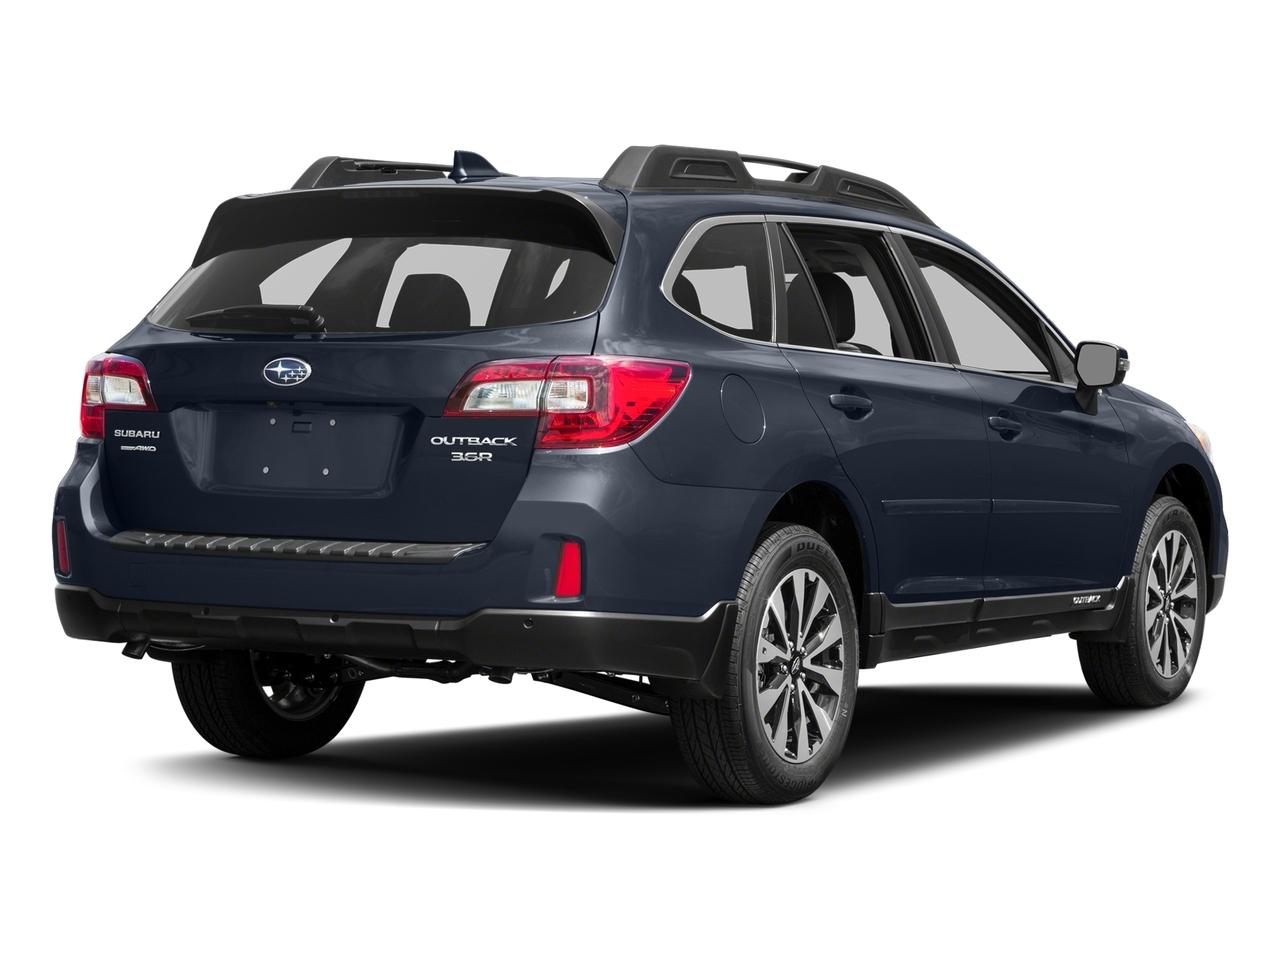 2017 Subaru Outback 3.6R SUV Slide